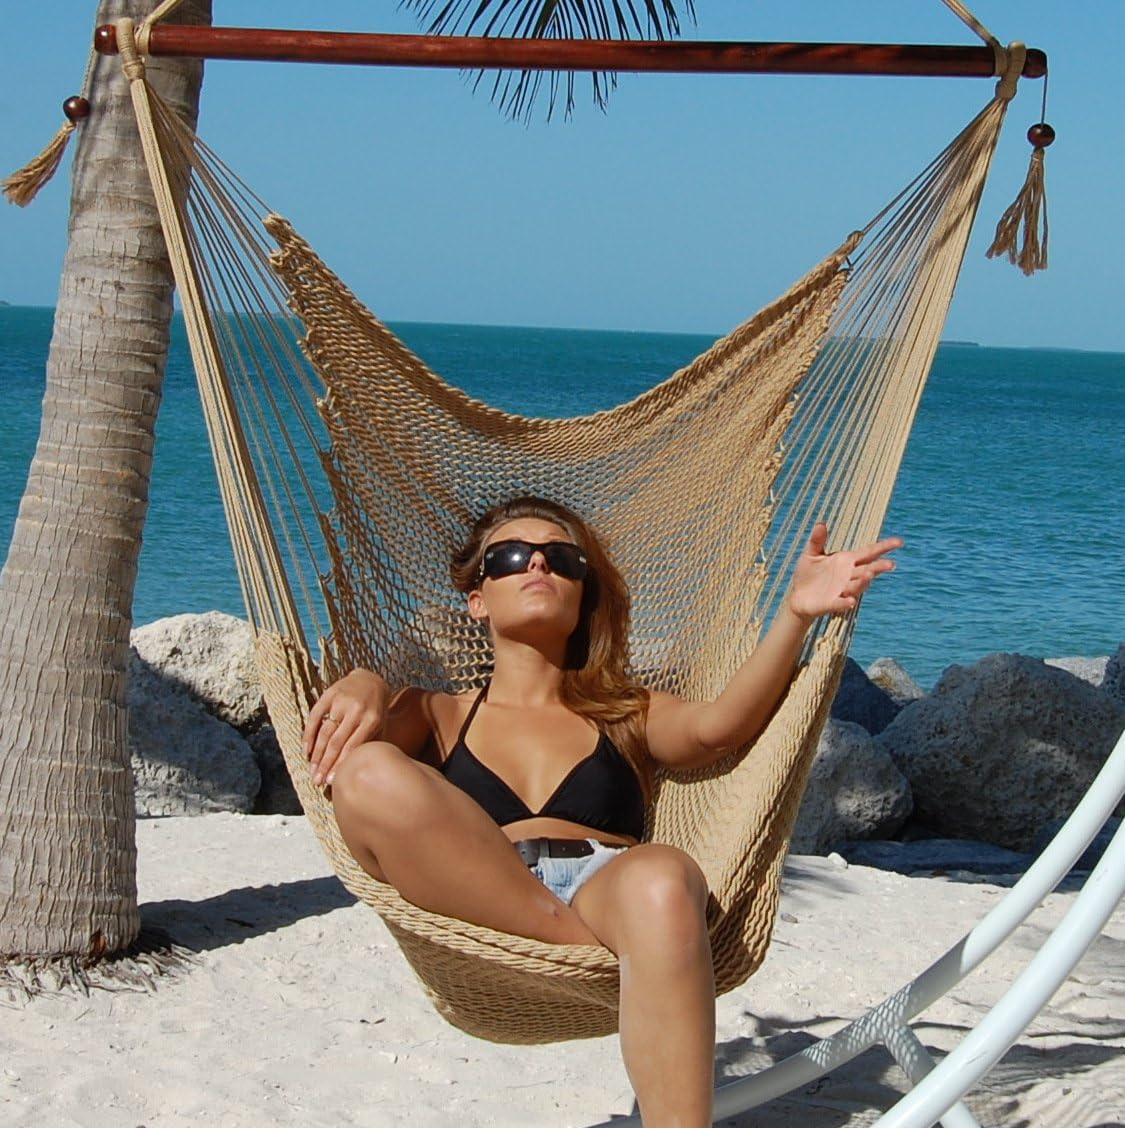 Caribbean Hammocks Large 48-Inch Polyester Hammock Chair - Tan - 300 lbs Weight Capacity